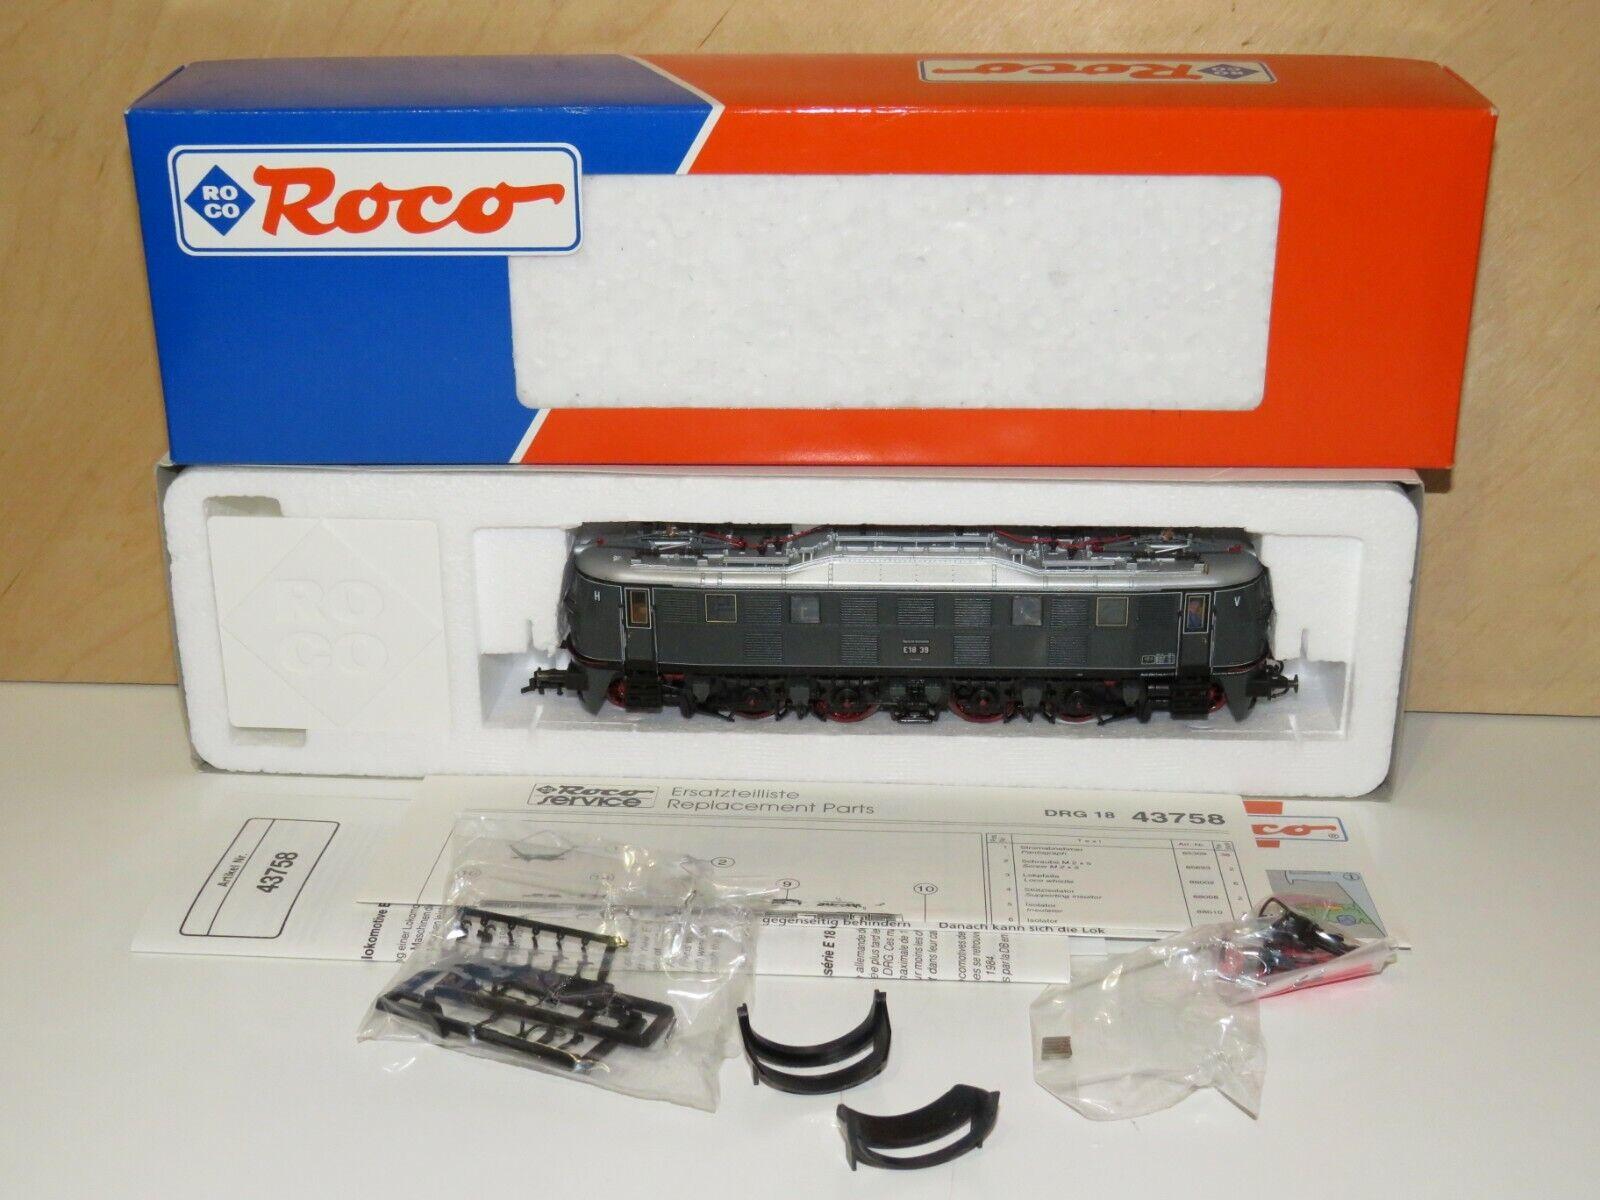 H0 Roco 43758 DSS Elektrolok BR 18 39 der DRG  Neuwertig  OVP    3513